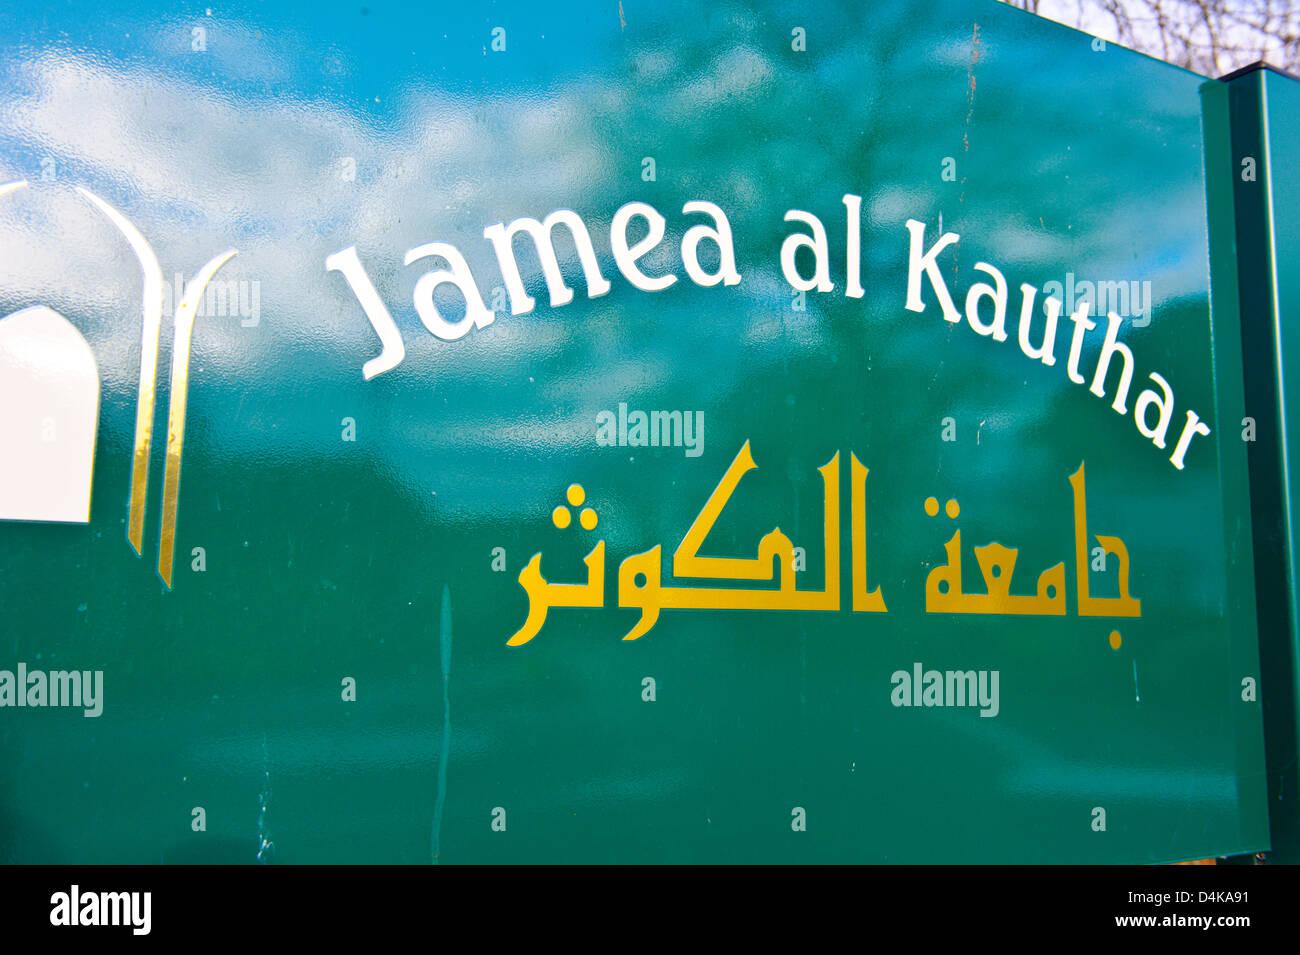 Islamic School Stock Photos & Islamic School Stock Images